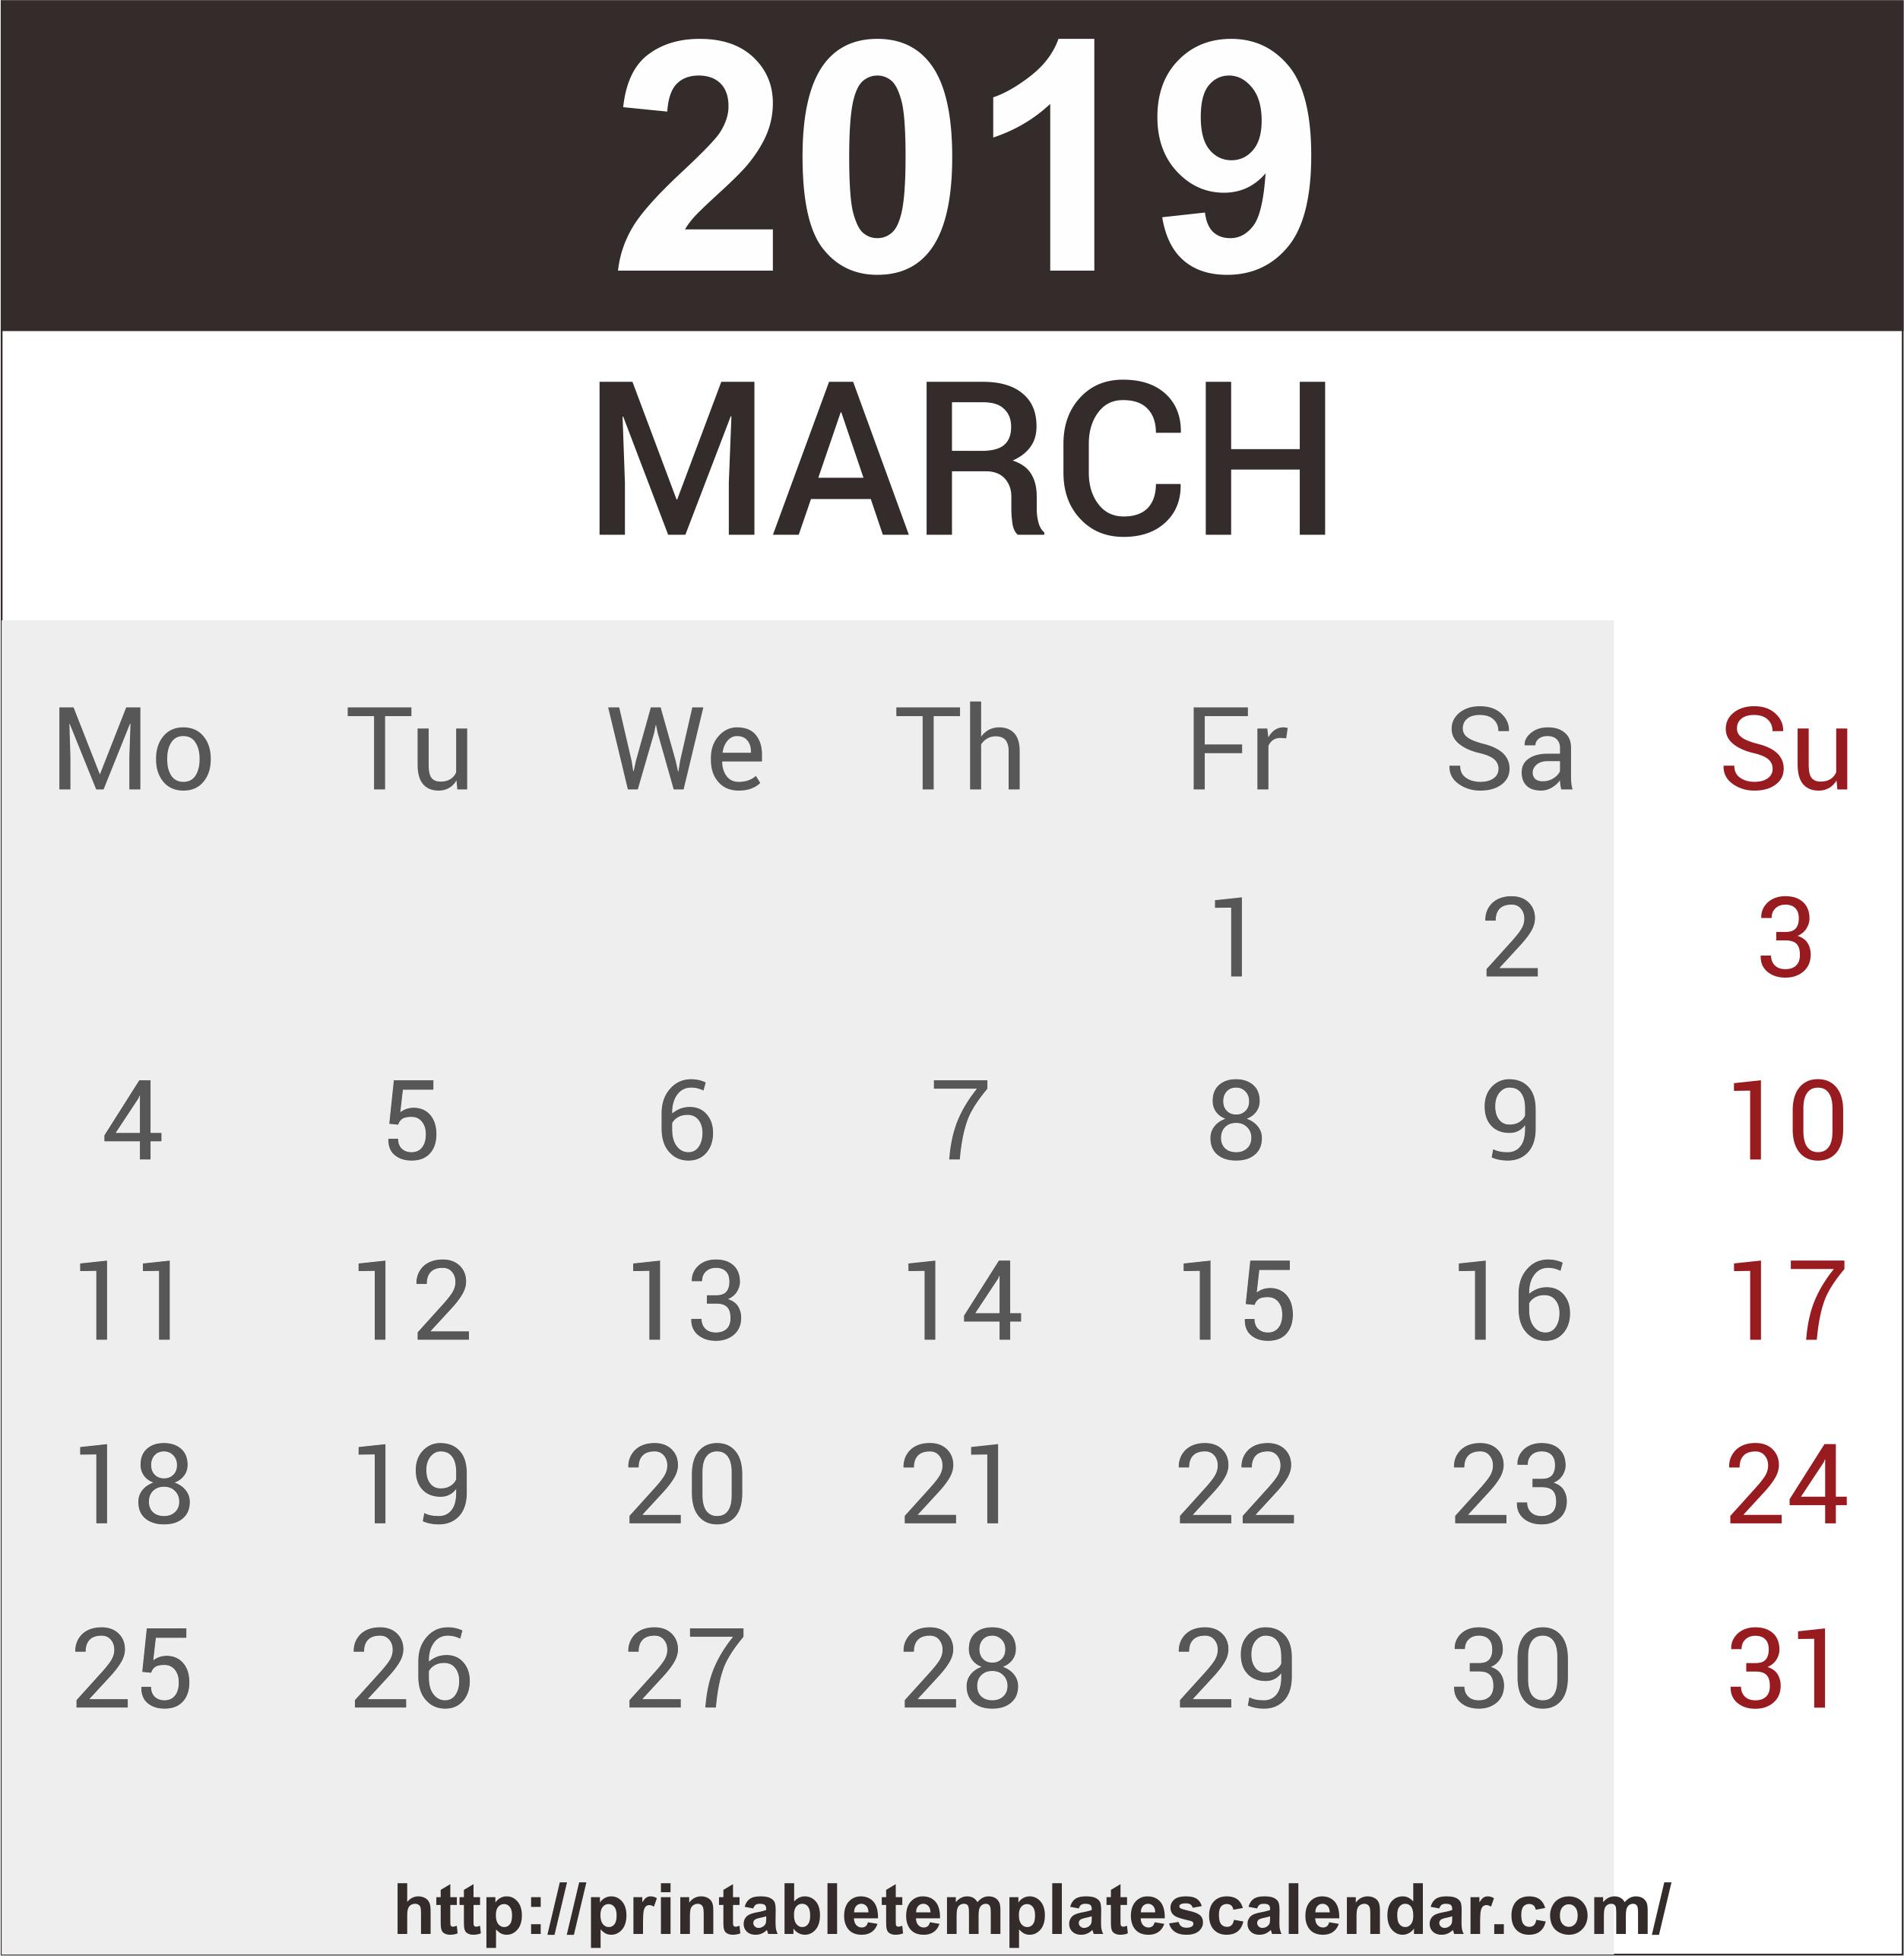 Editable March 2019 Calendar Printable